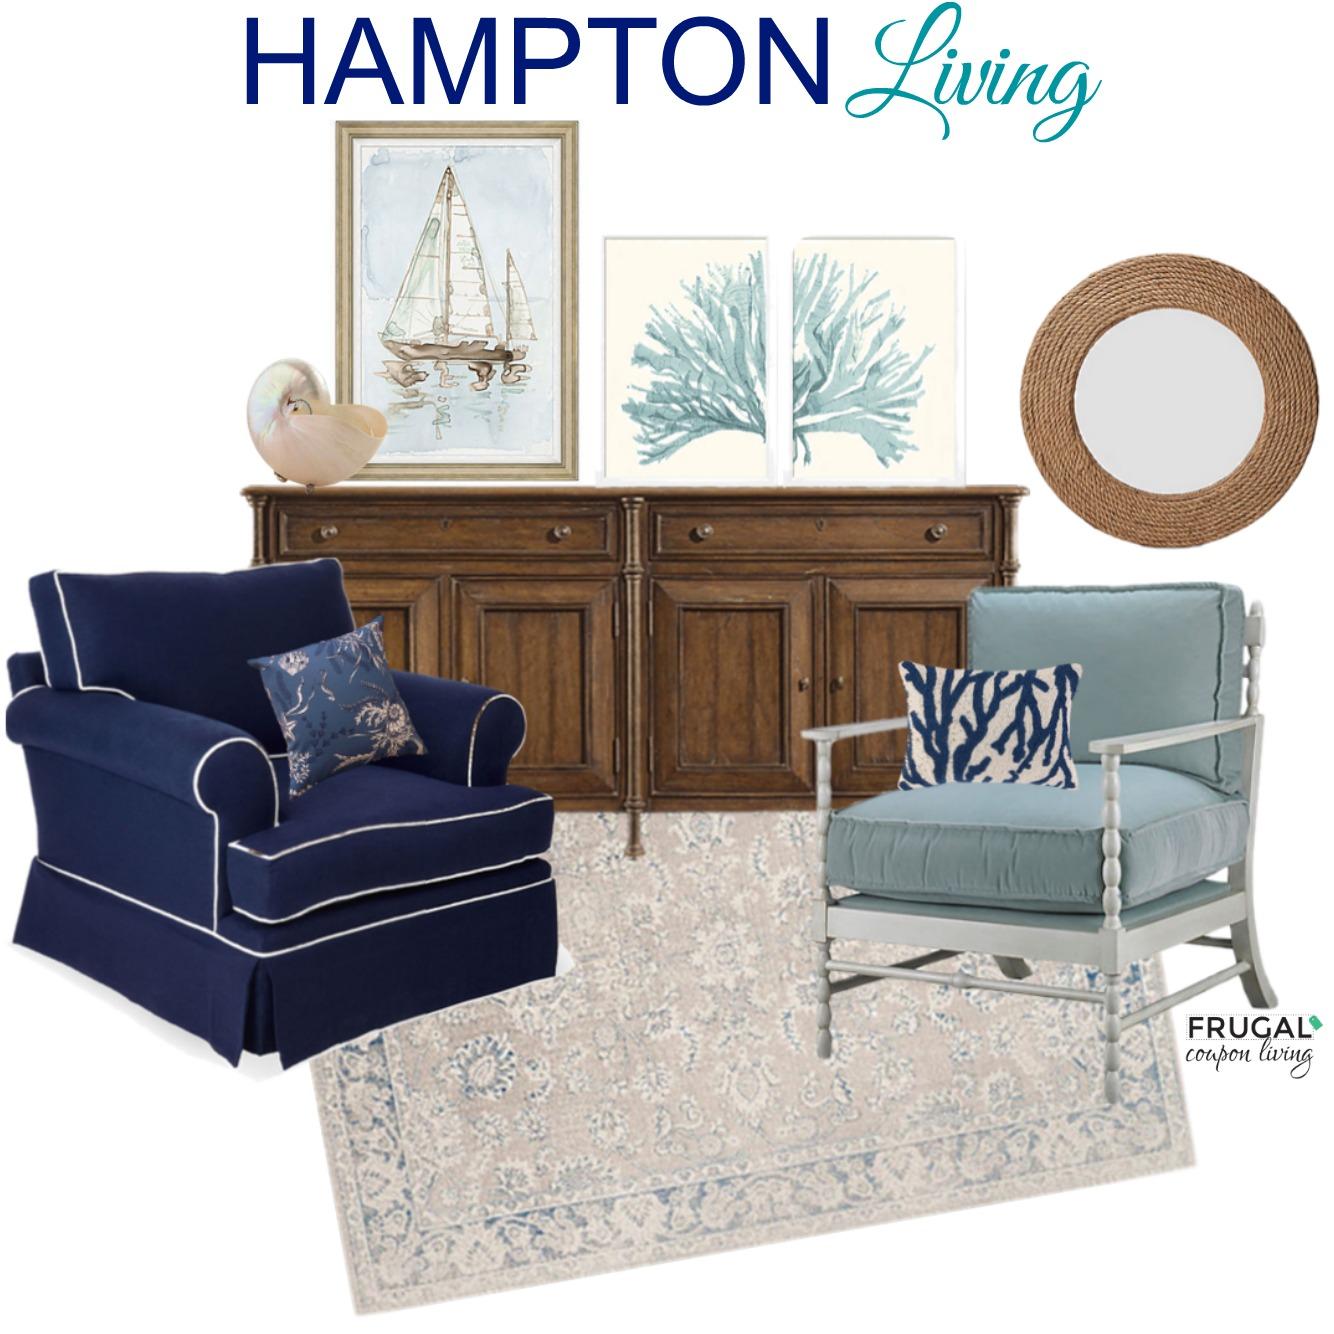 hampton-living-frugal-coupon-living